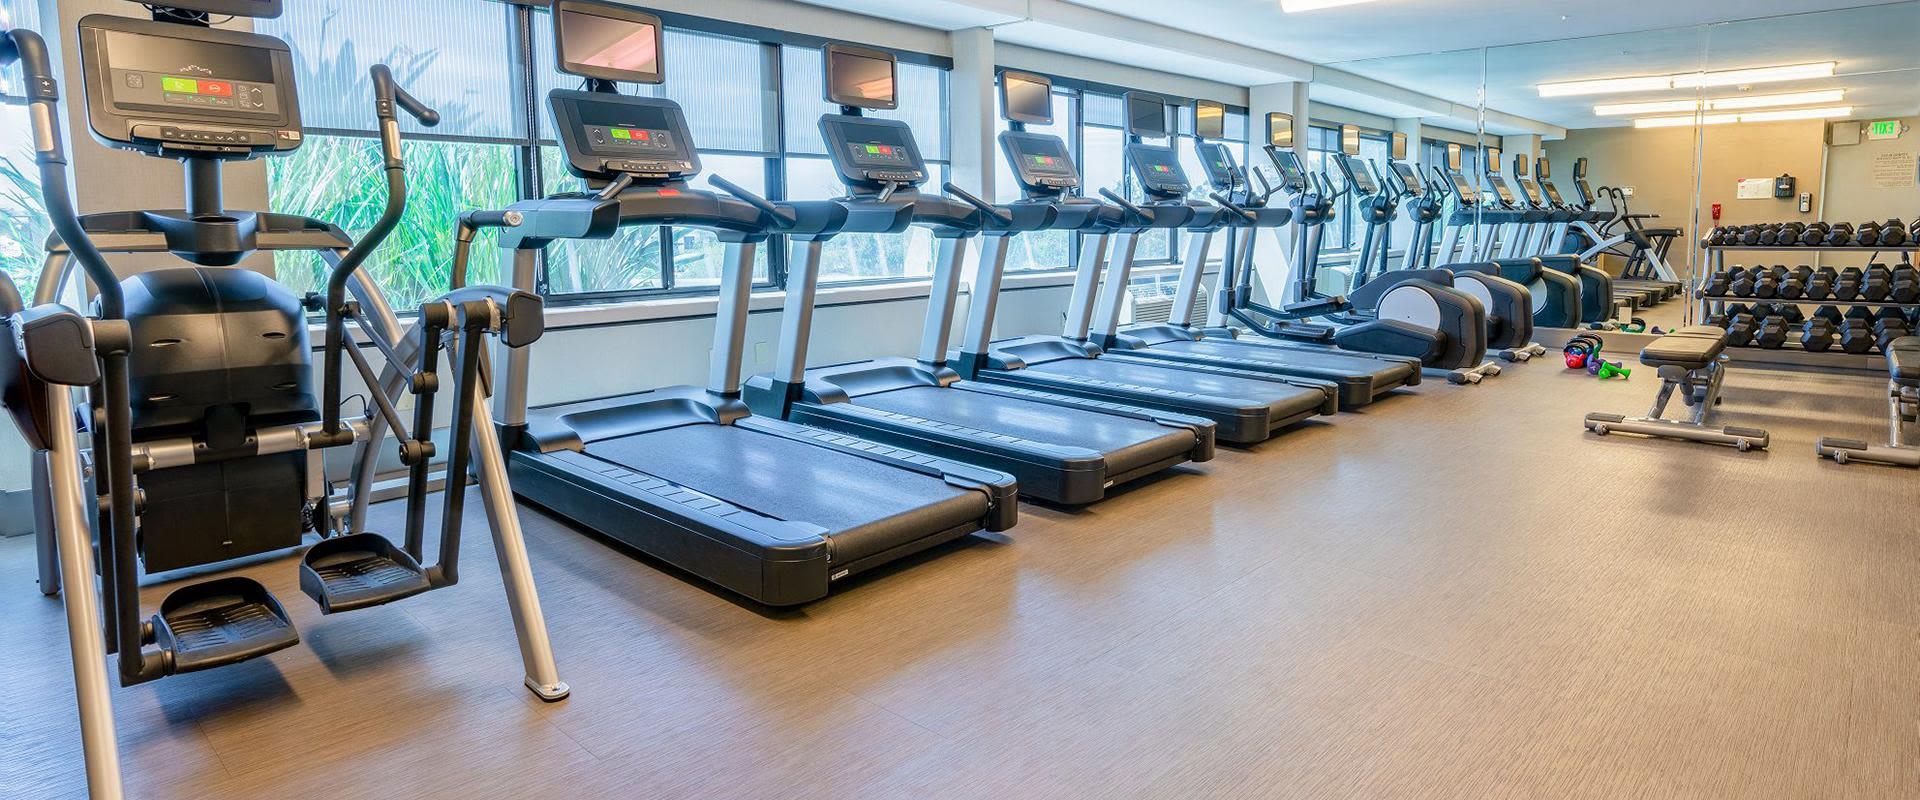 San Jose Hotel Fitness Center Machines